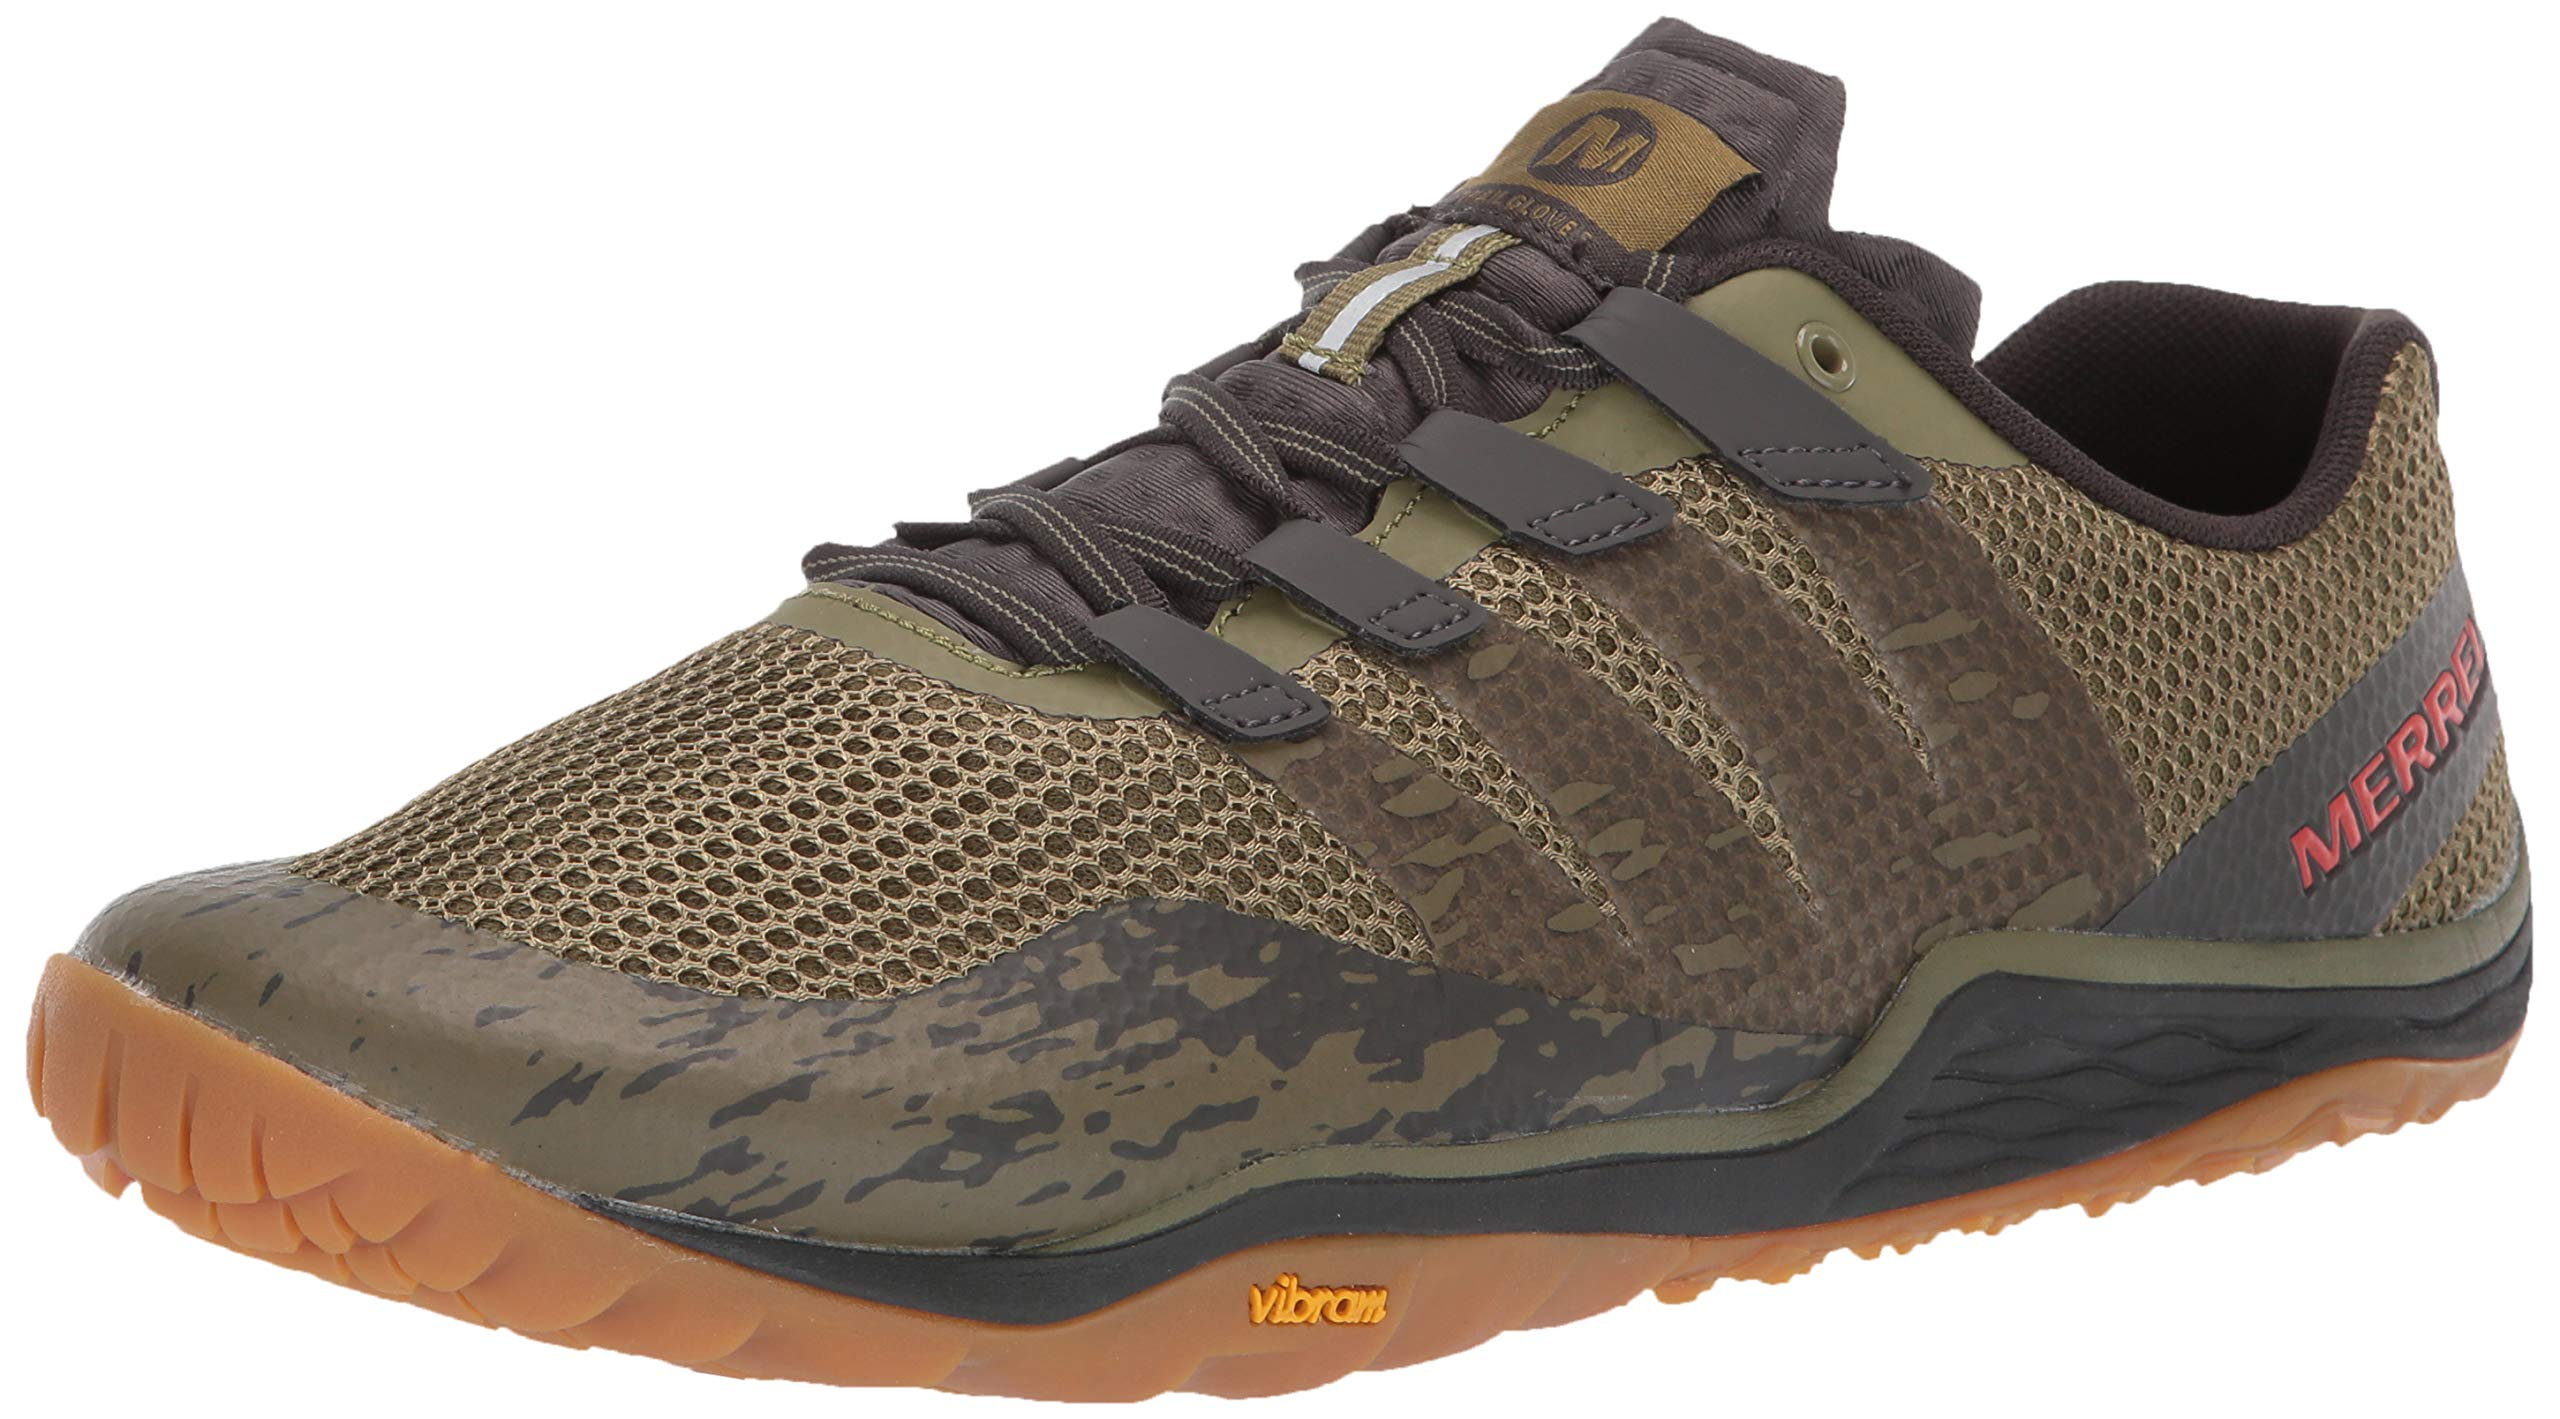 Merrell Men's Trail Glove 5 Sneaker, Olive DRAB/Beluga, 07.0 M US